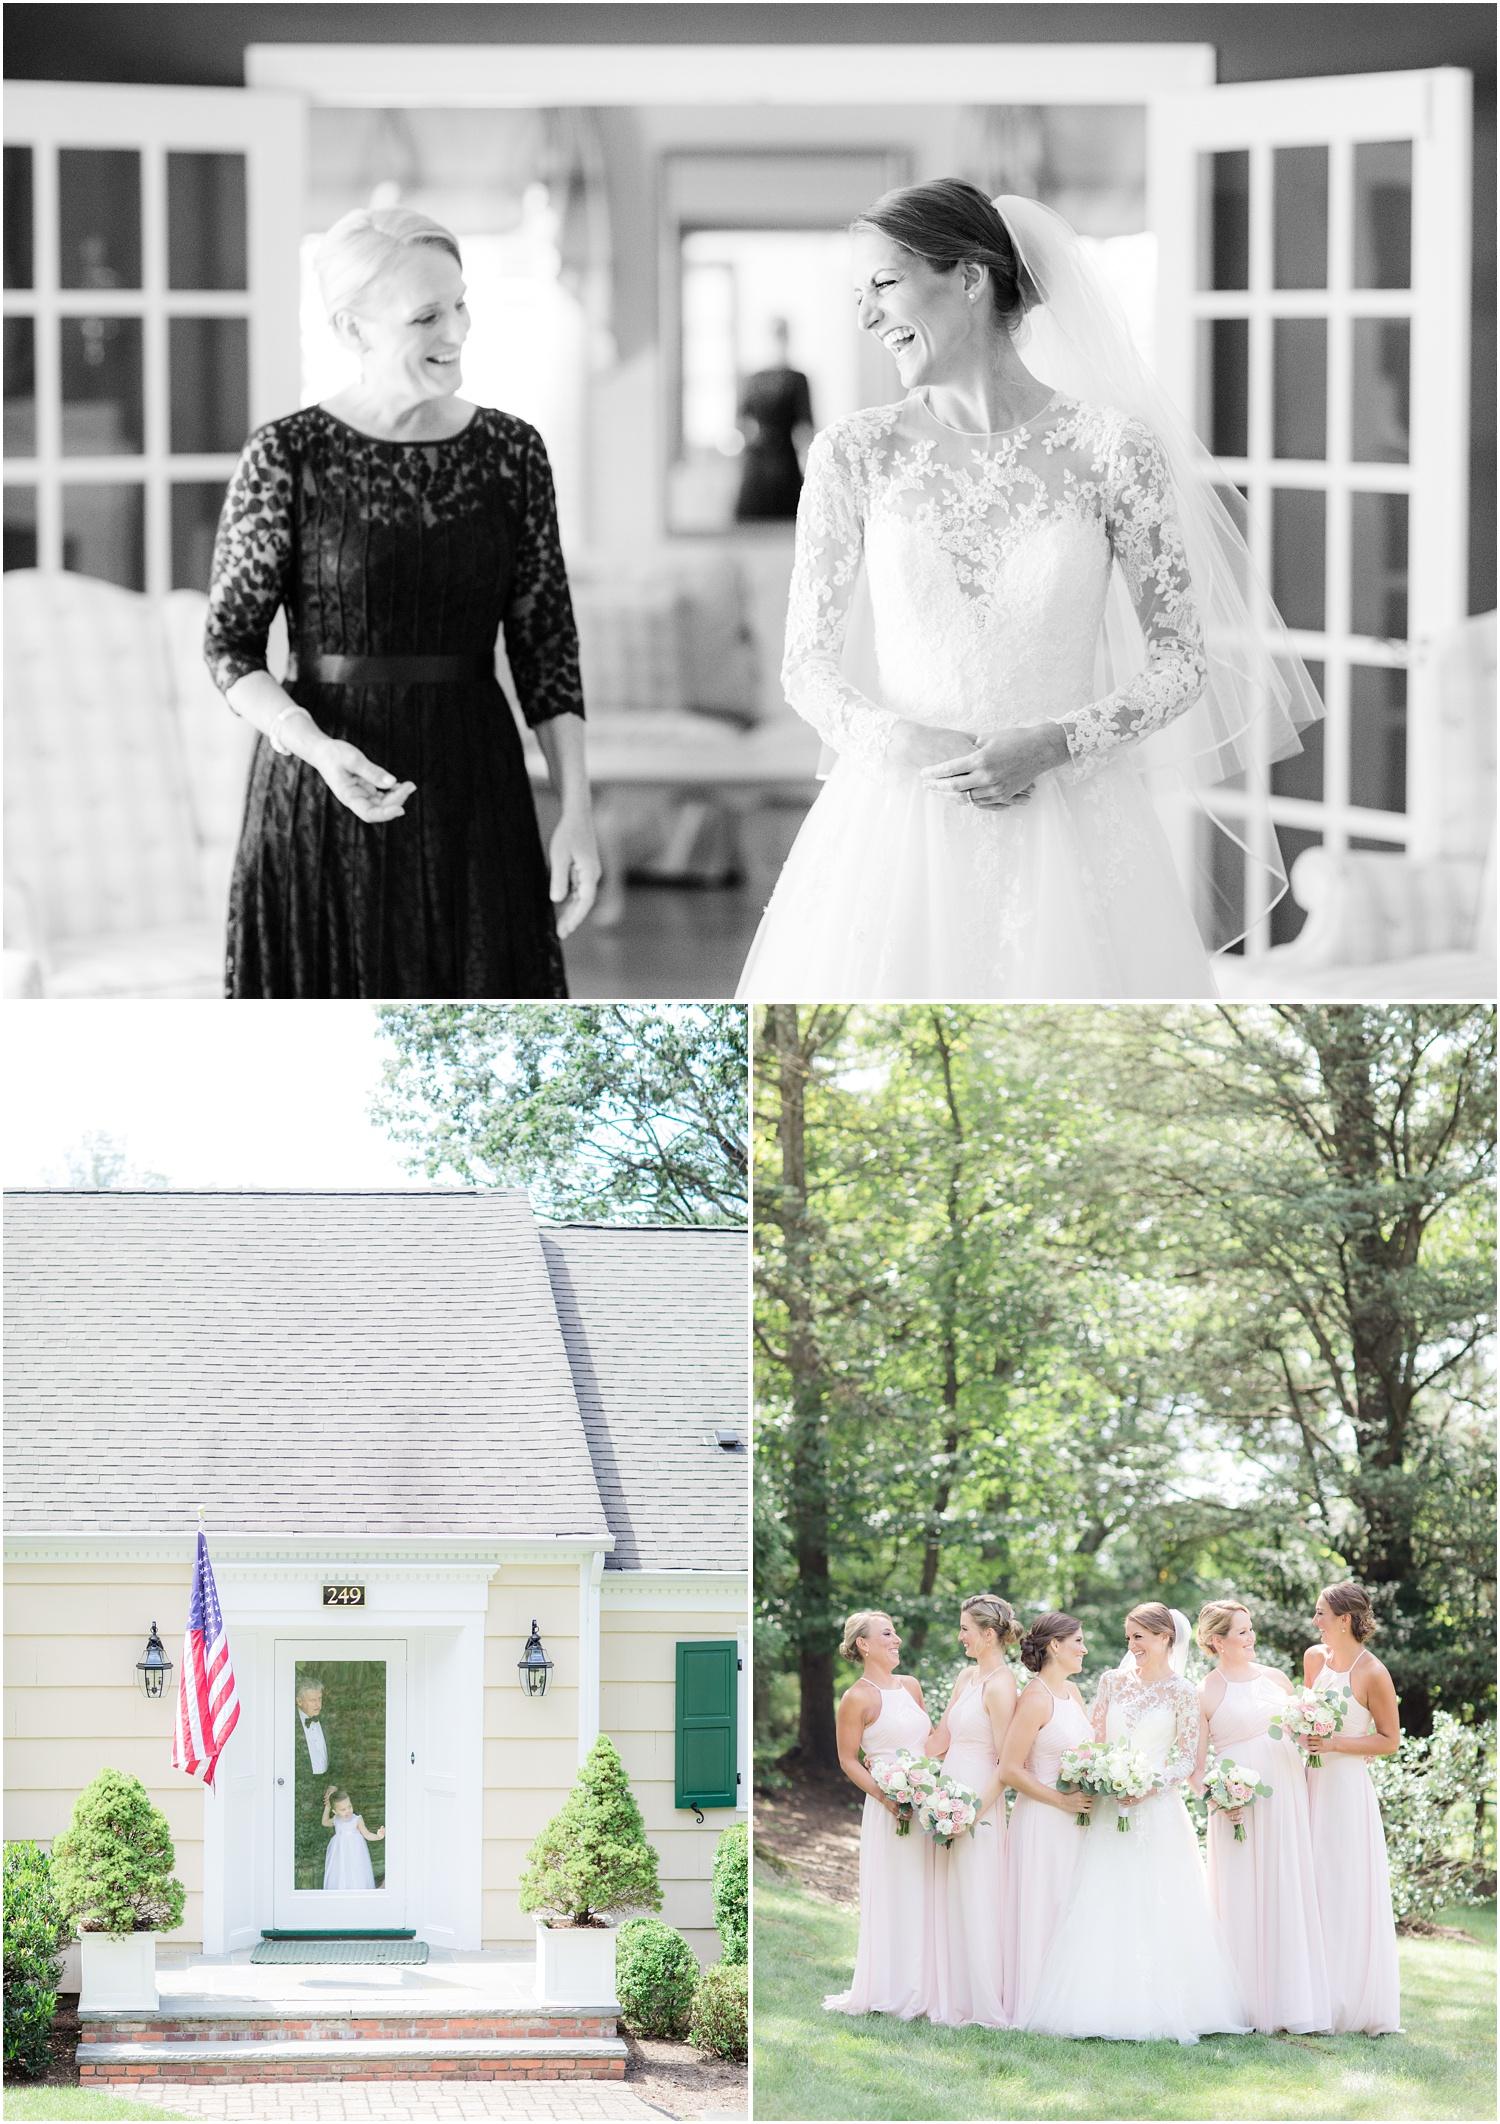 Copy of Bridesmaid photos home in Short Hills, NJ.